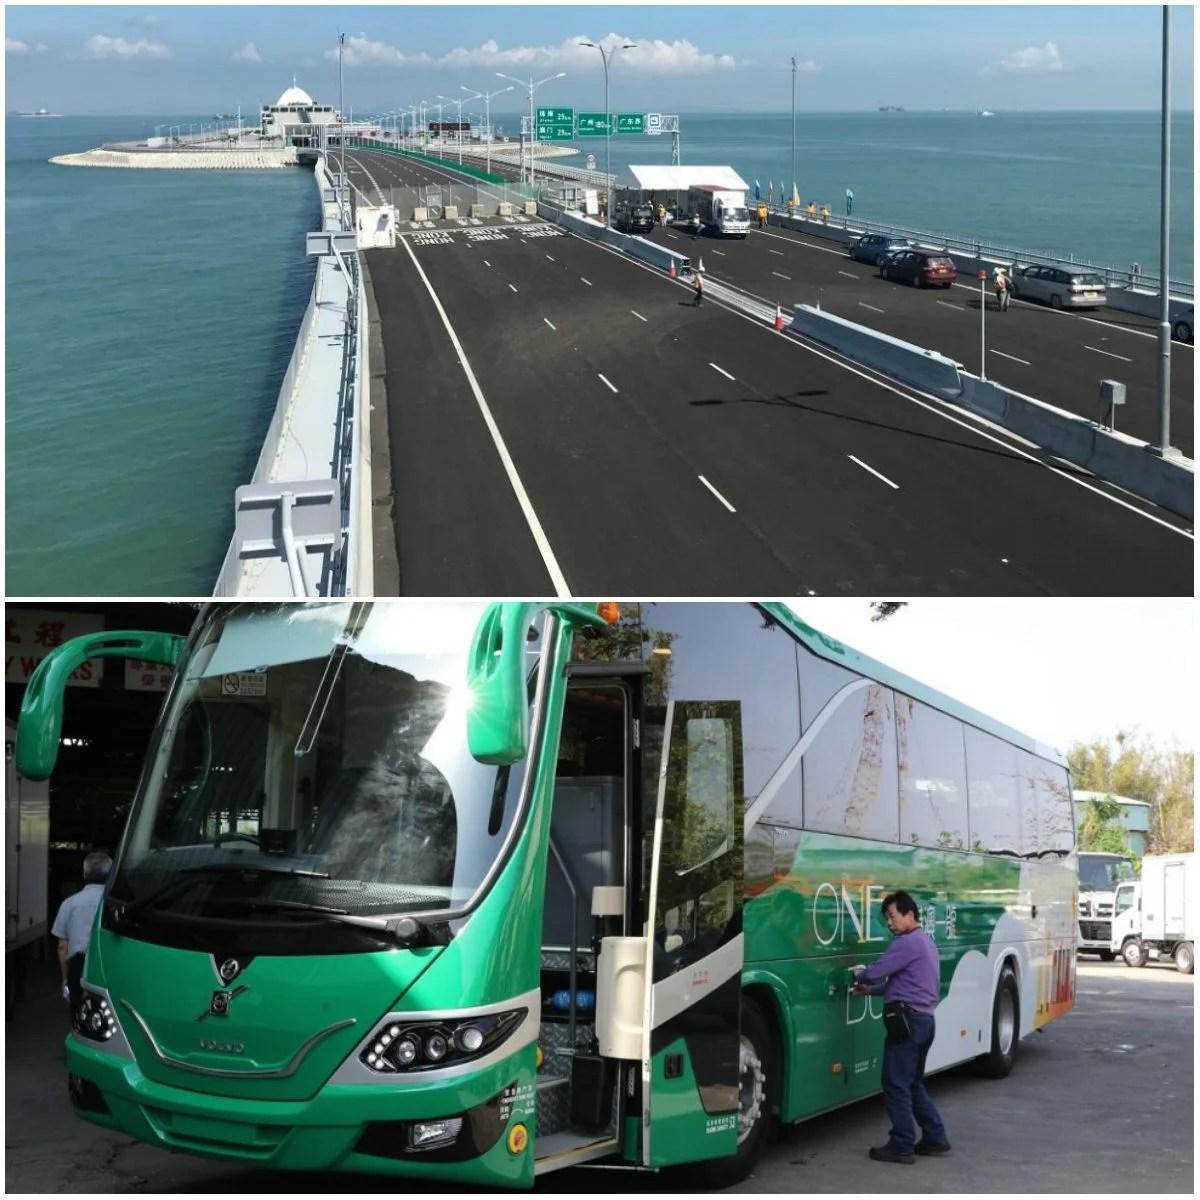 Macau Bus Announces Service Sands Casinos Hong Kong